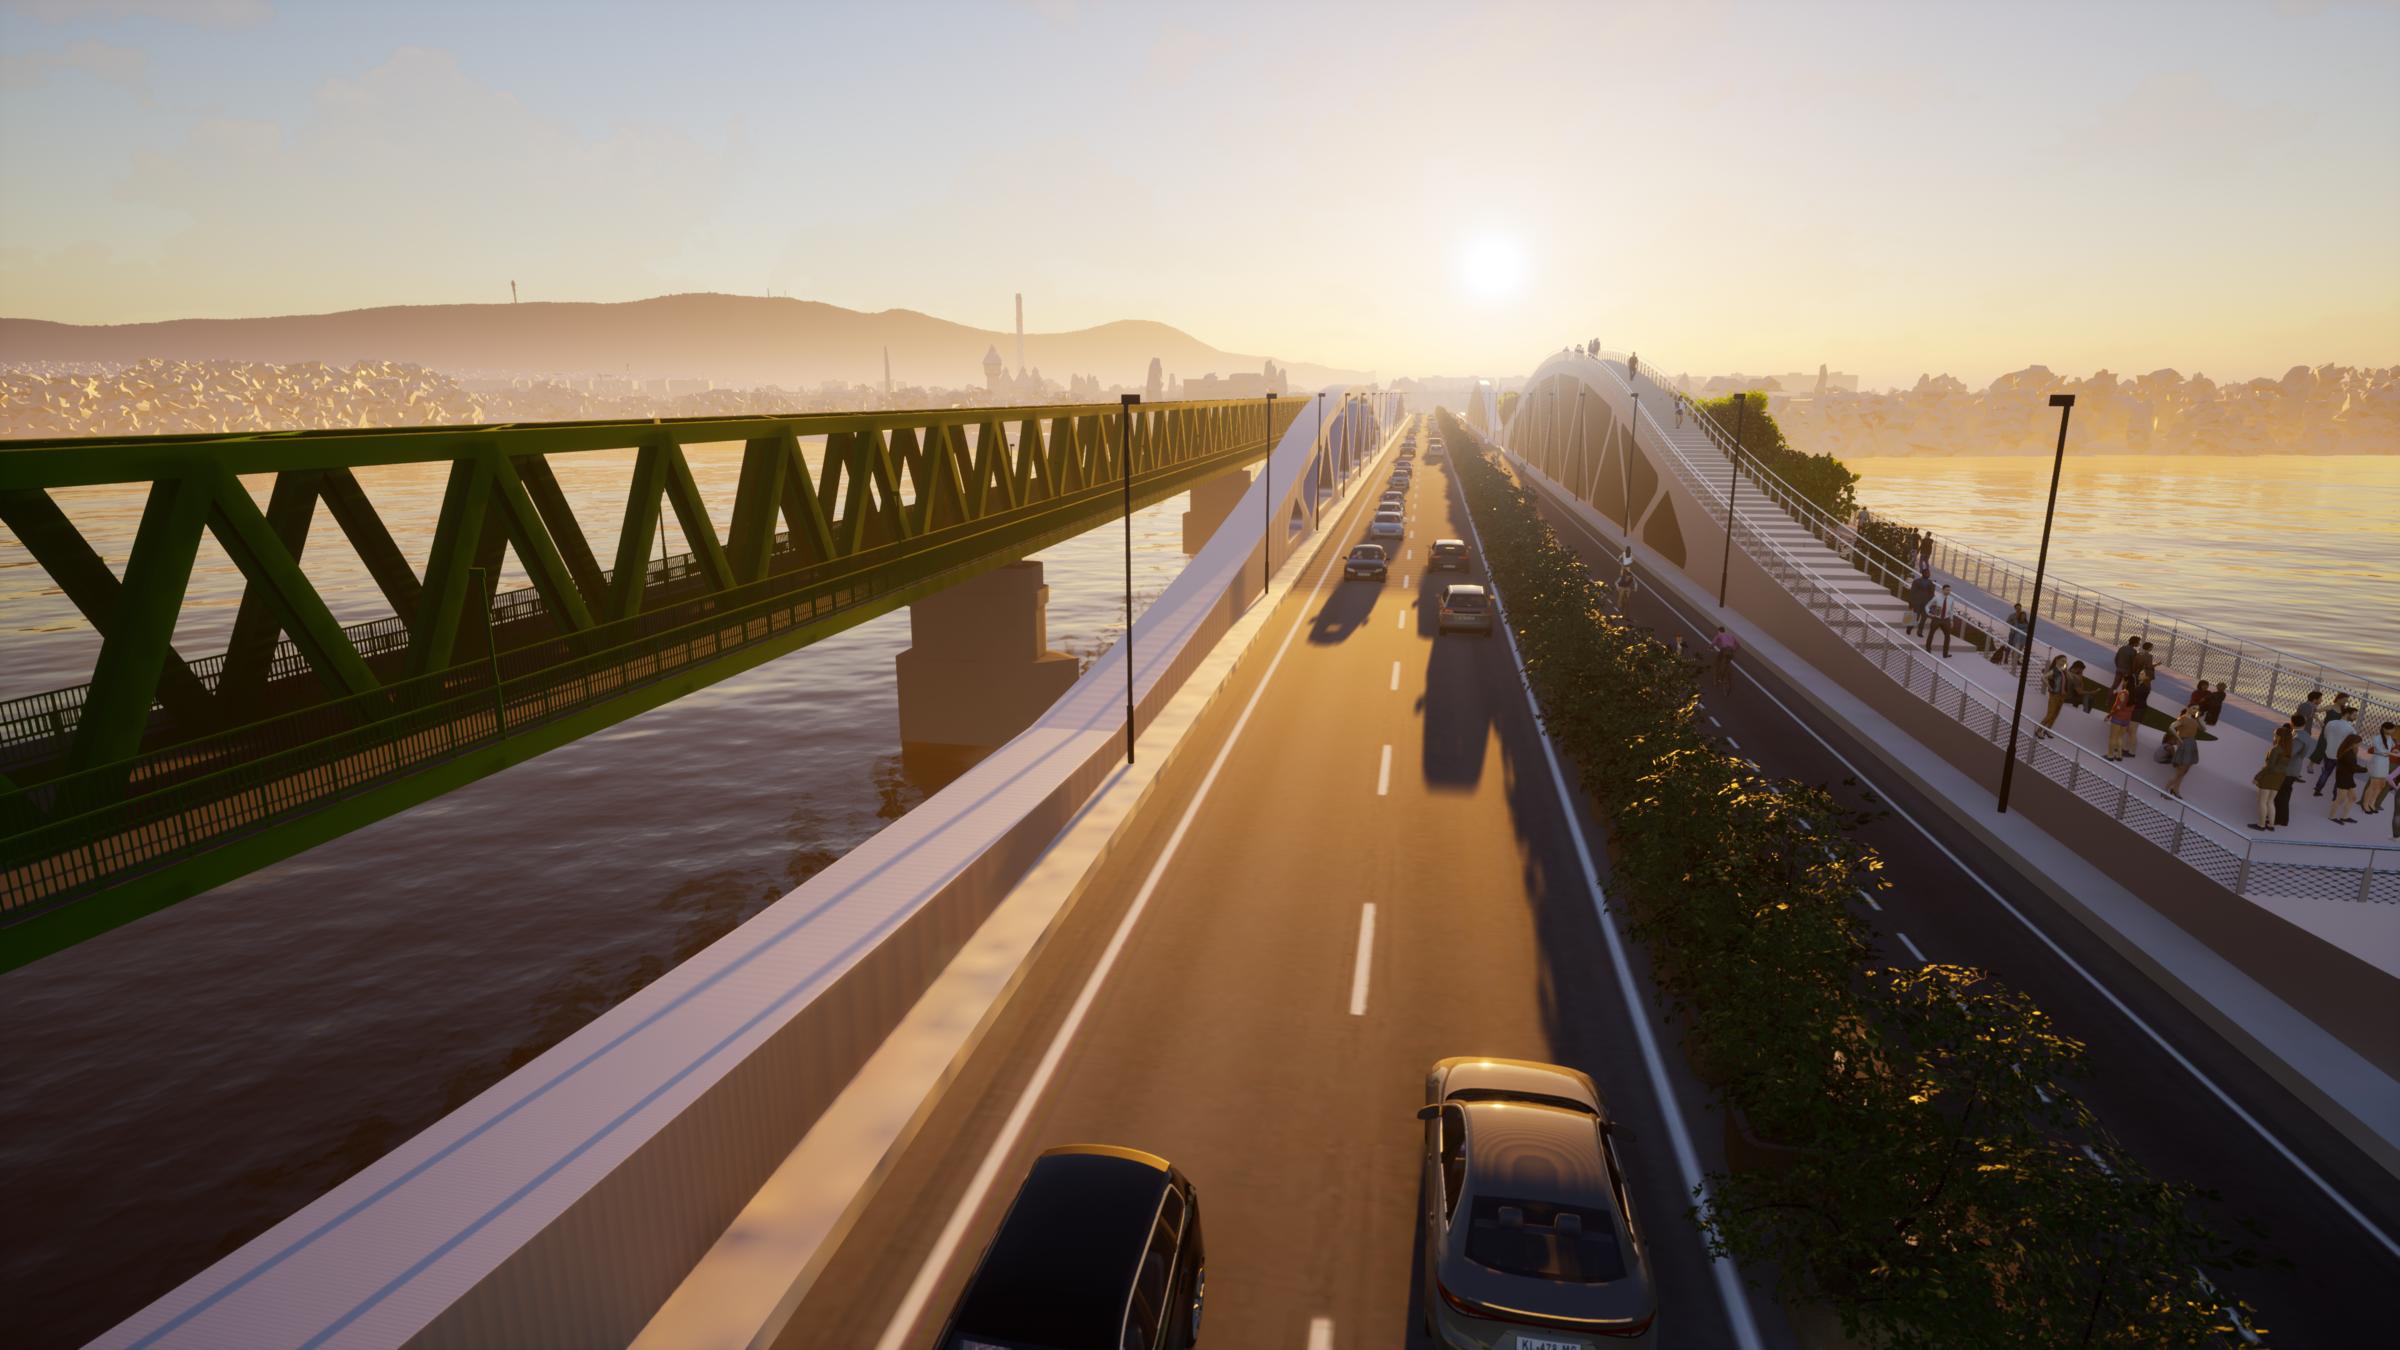 The 'green' bridge - with 2x1 lanes